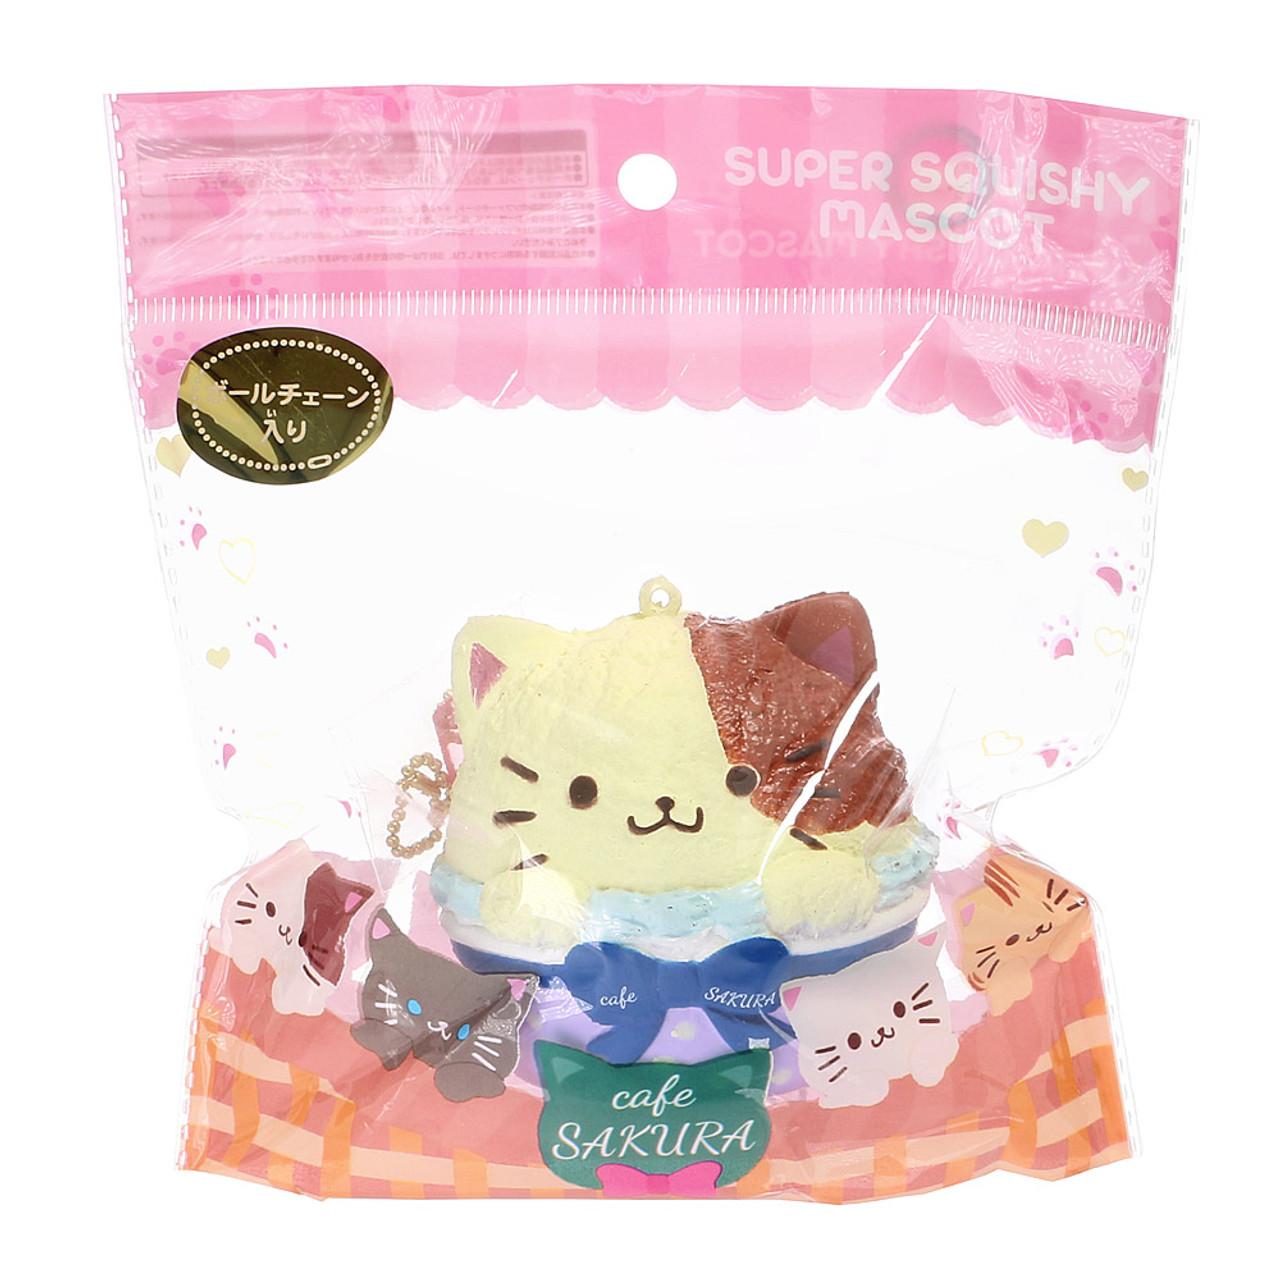 Cafe Sakura Calico Cat Cupcake Baron Mascot Squishy Toy Charm ( Packing View )